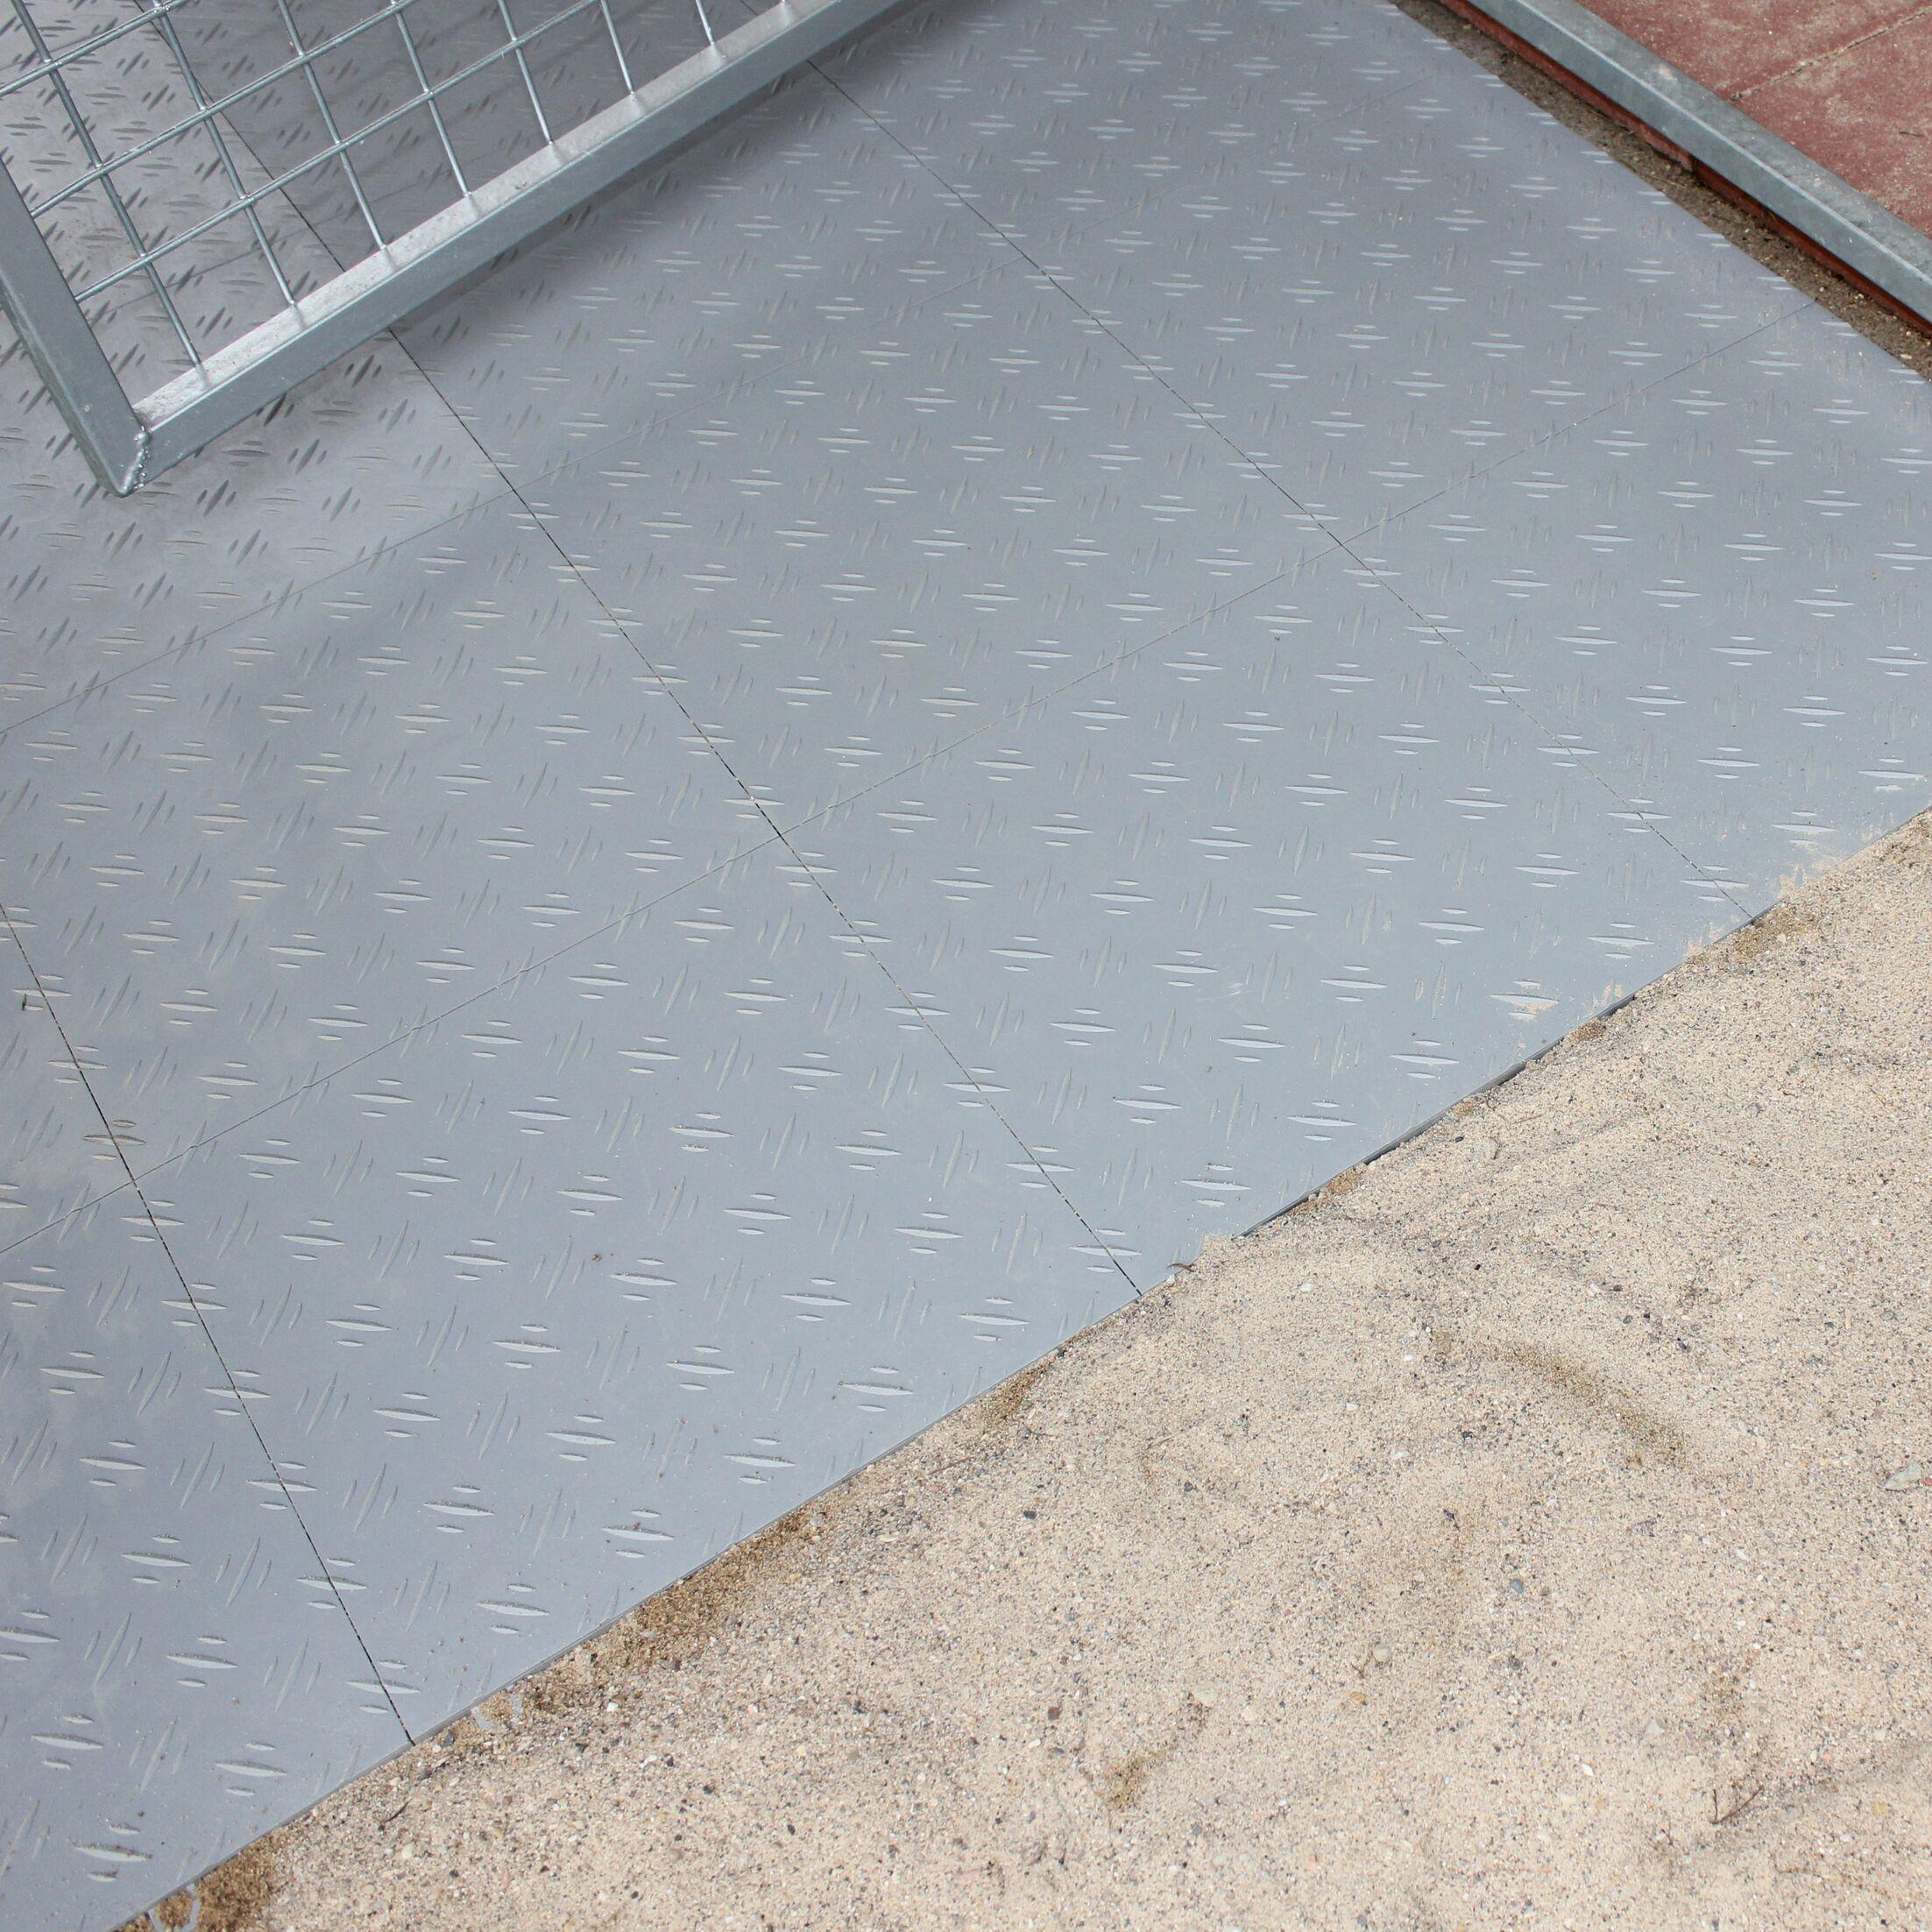 Basic Yard Kennel Tile Flooring System Size: 0.5